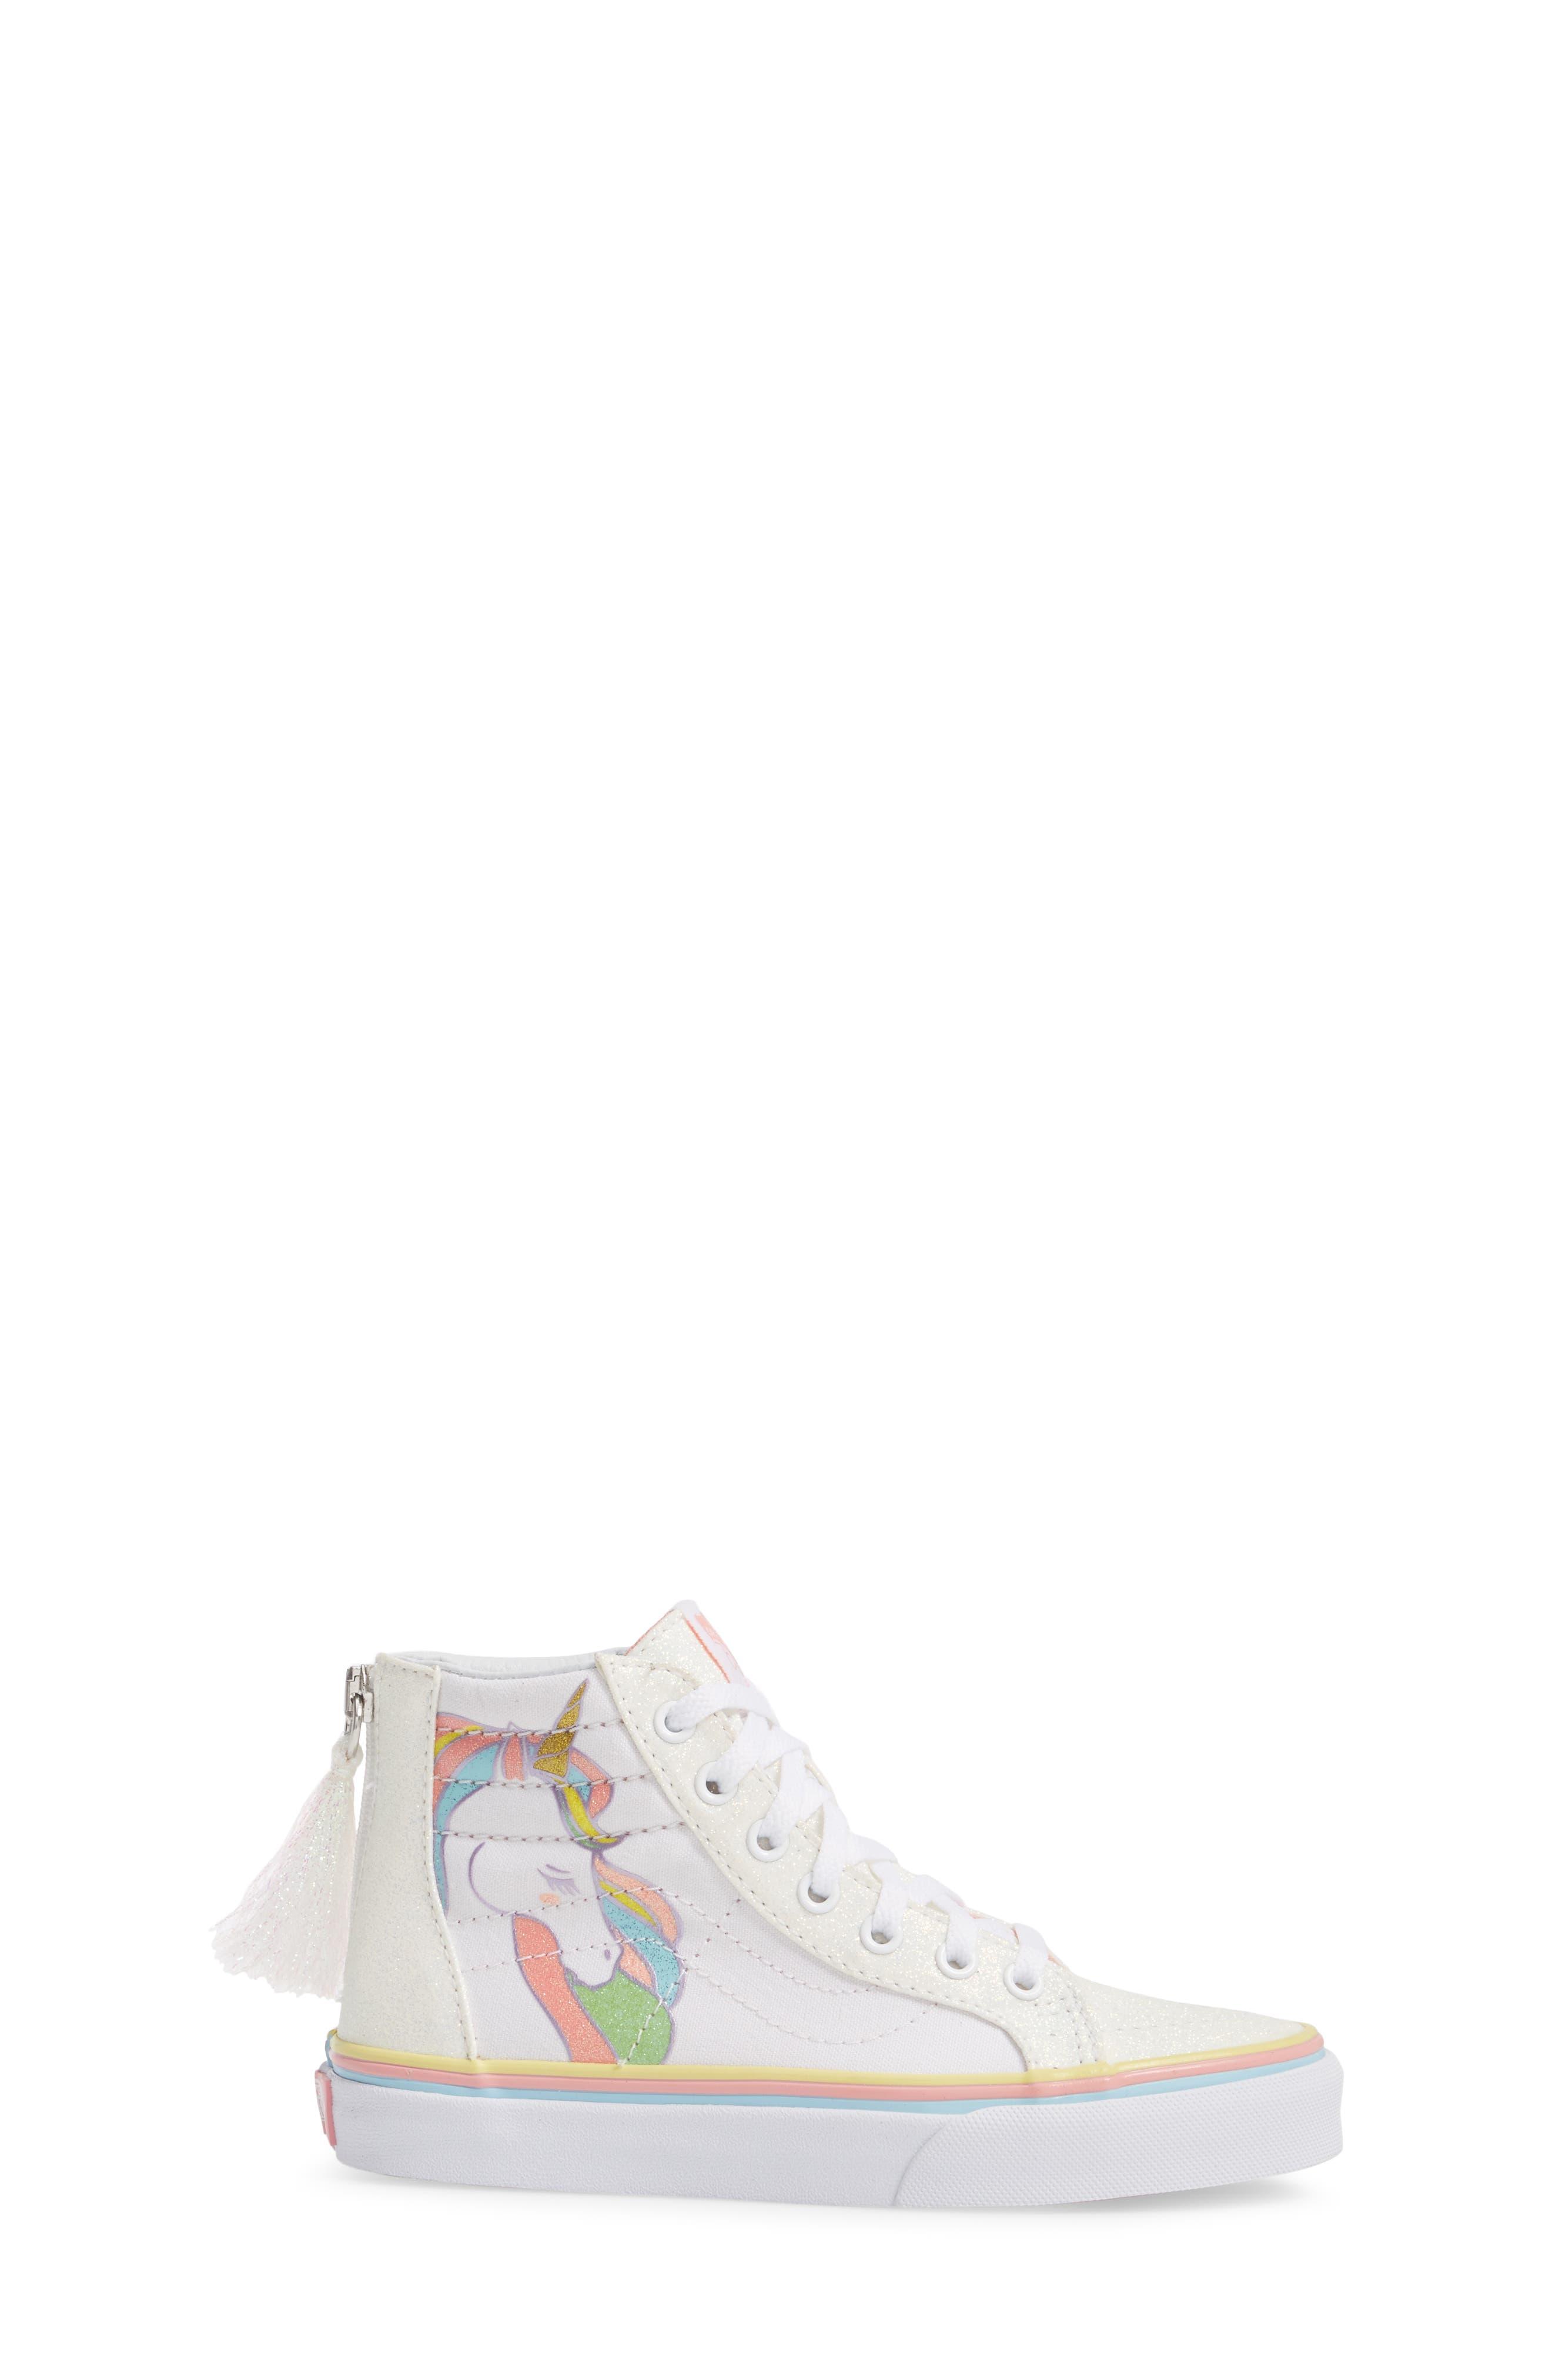 Sk8-Hi Zip Unicorn Glitter High Top Sneaker,                             Alternate thumbnail 3, color,                             White Glitter Unicorn